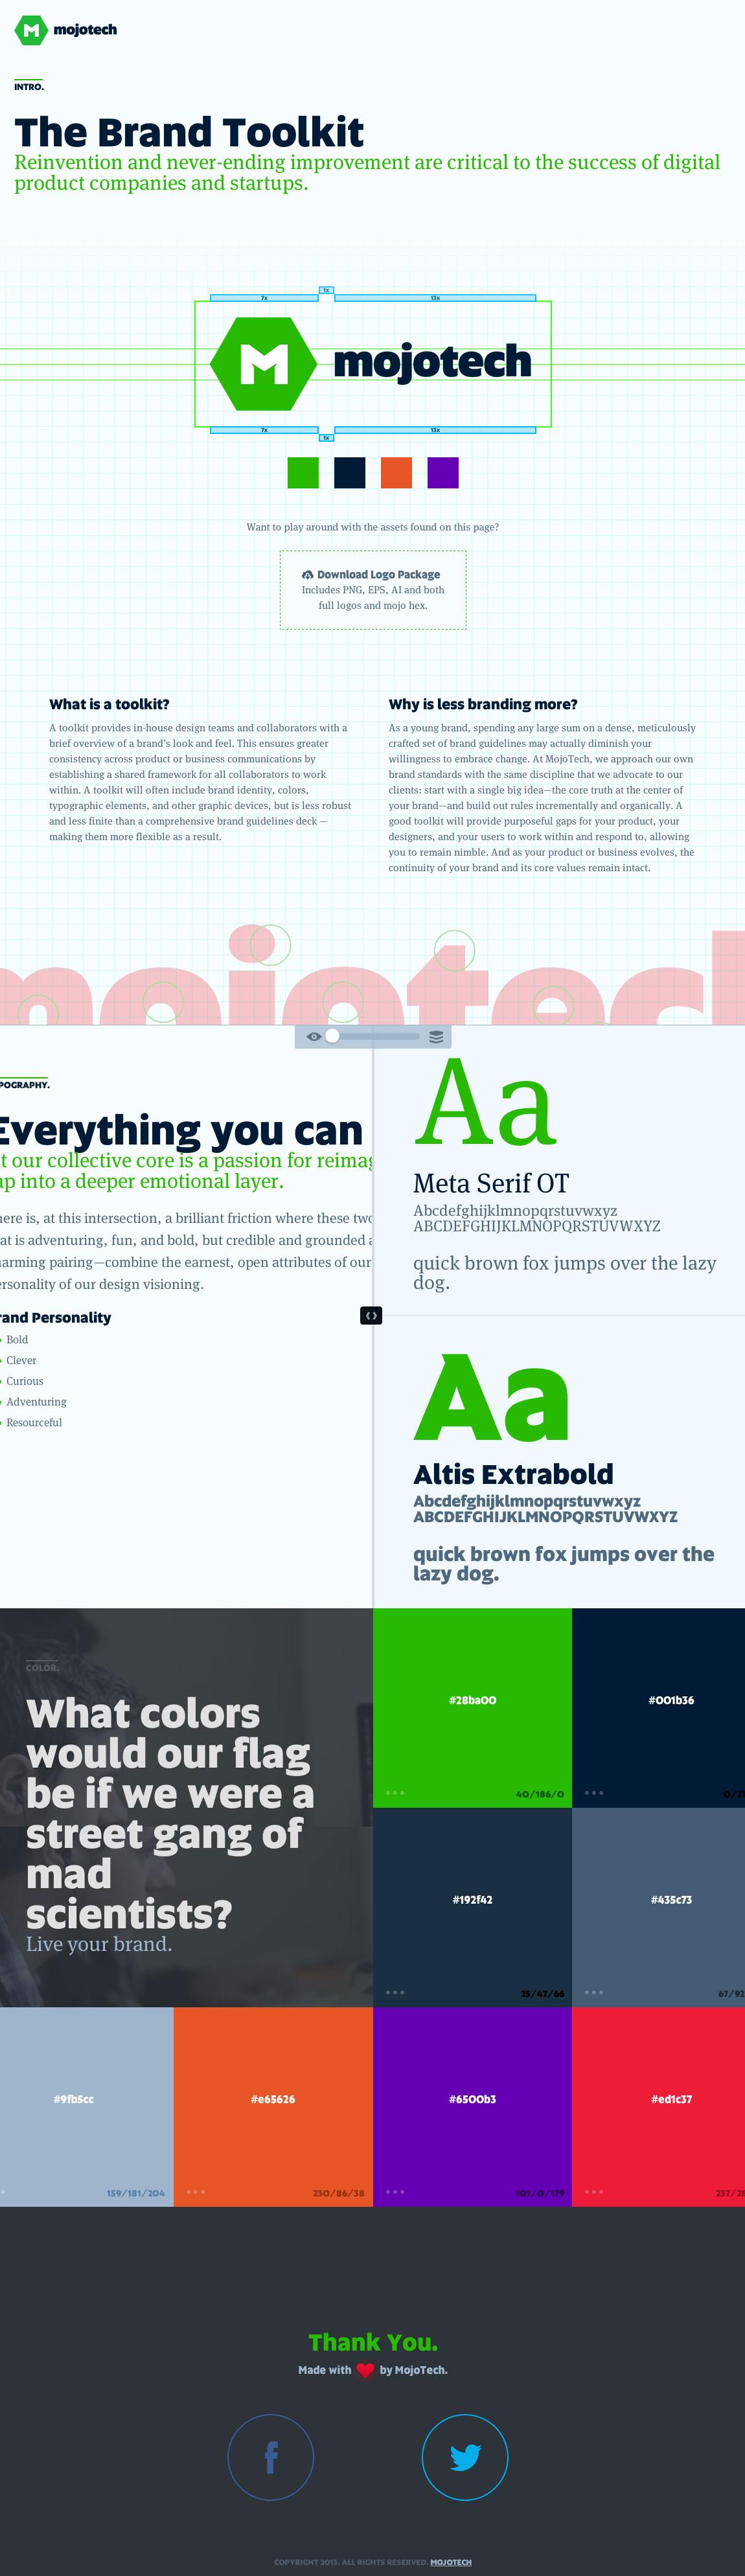 The Brand Toolkit Website Screenshot